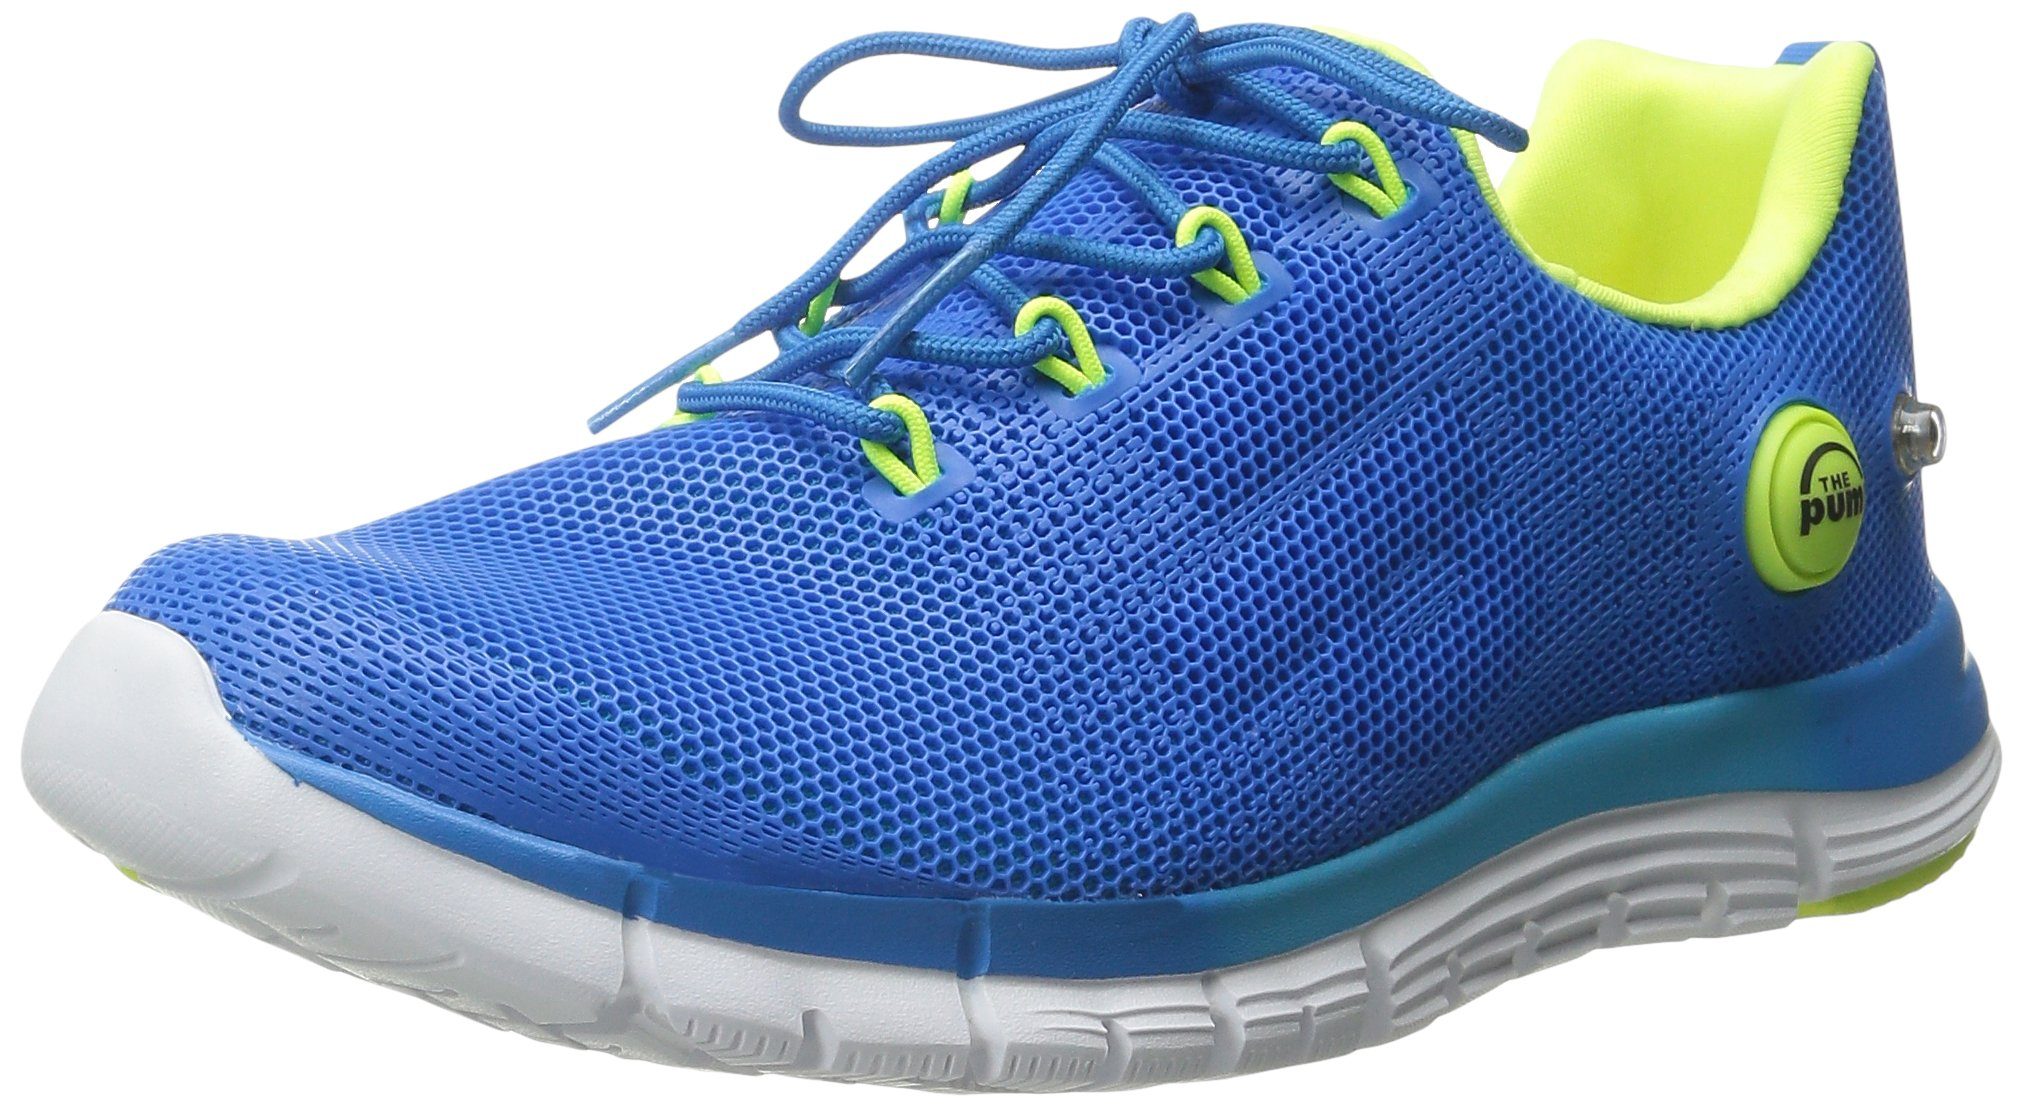 81zr2vgI9kL - Reebok Women's Z Pump Fusion Polyurethane Running Shoe